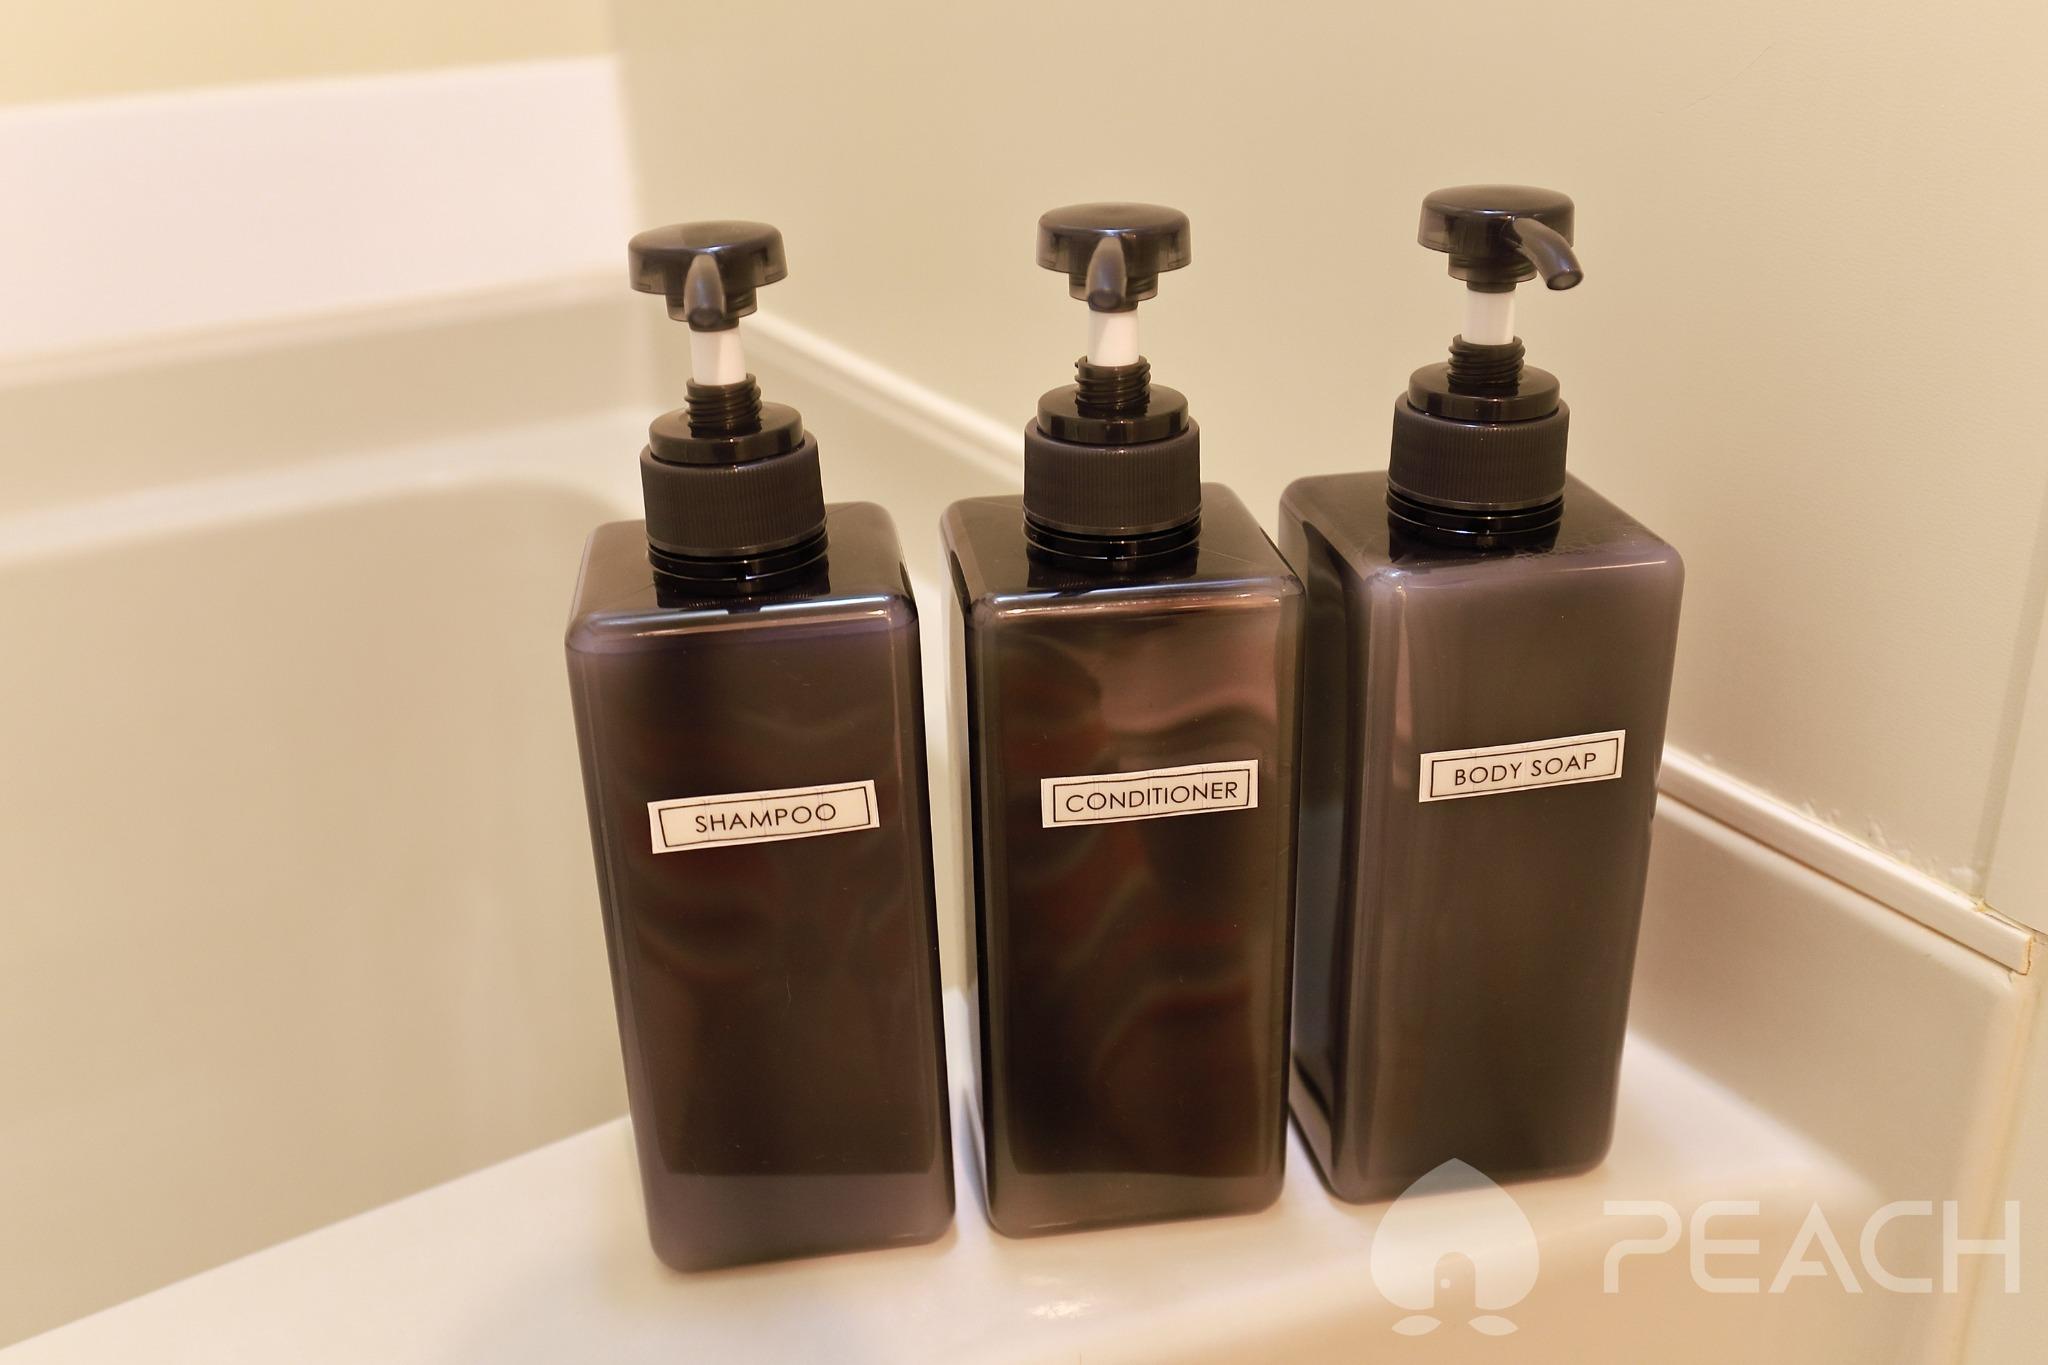 bath room ☆body soap, shampoo, conditioner